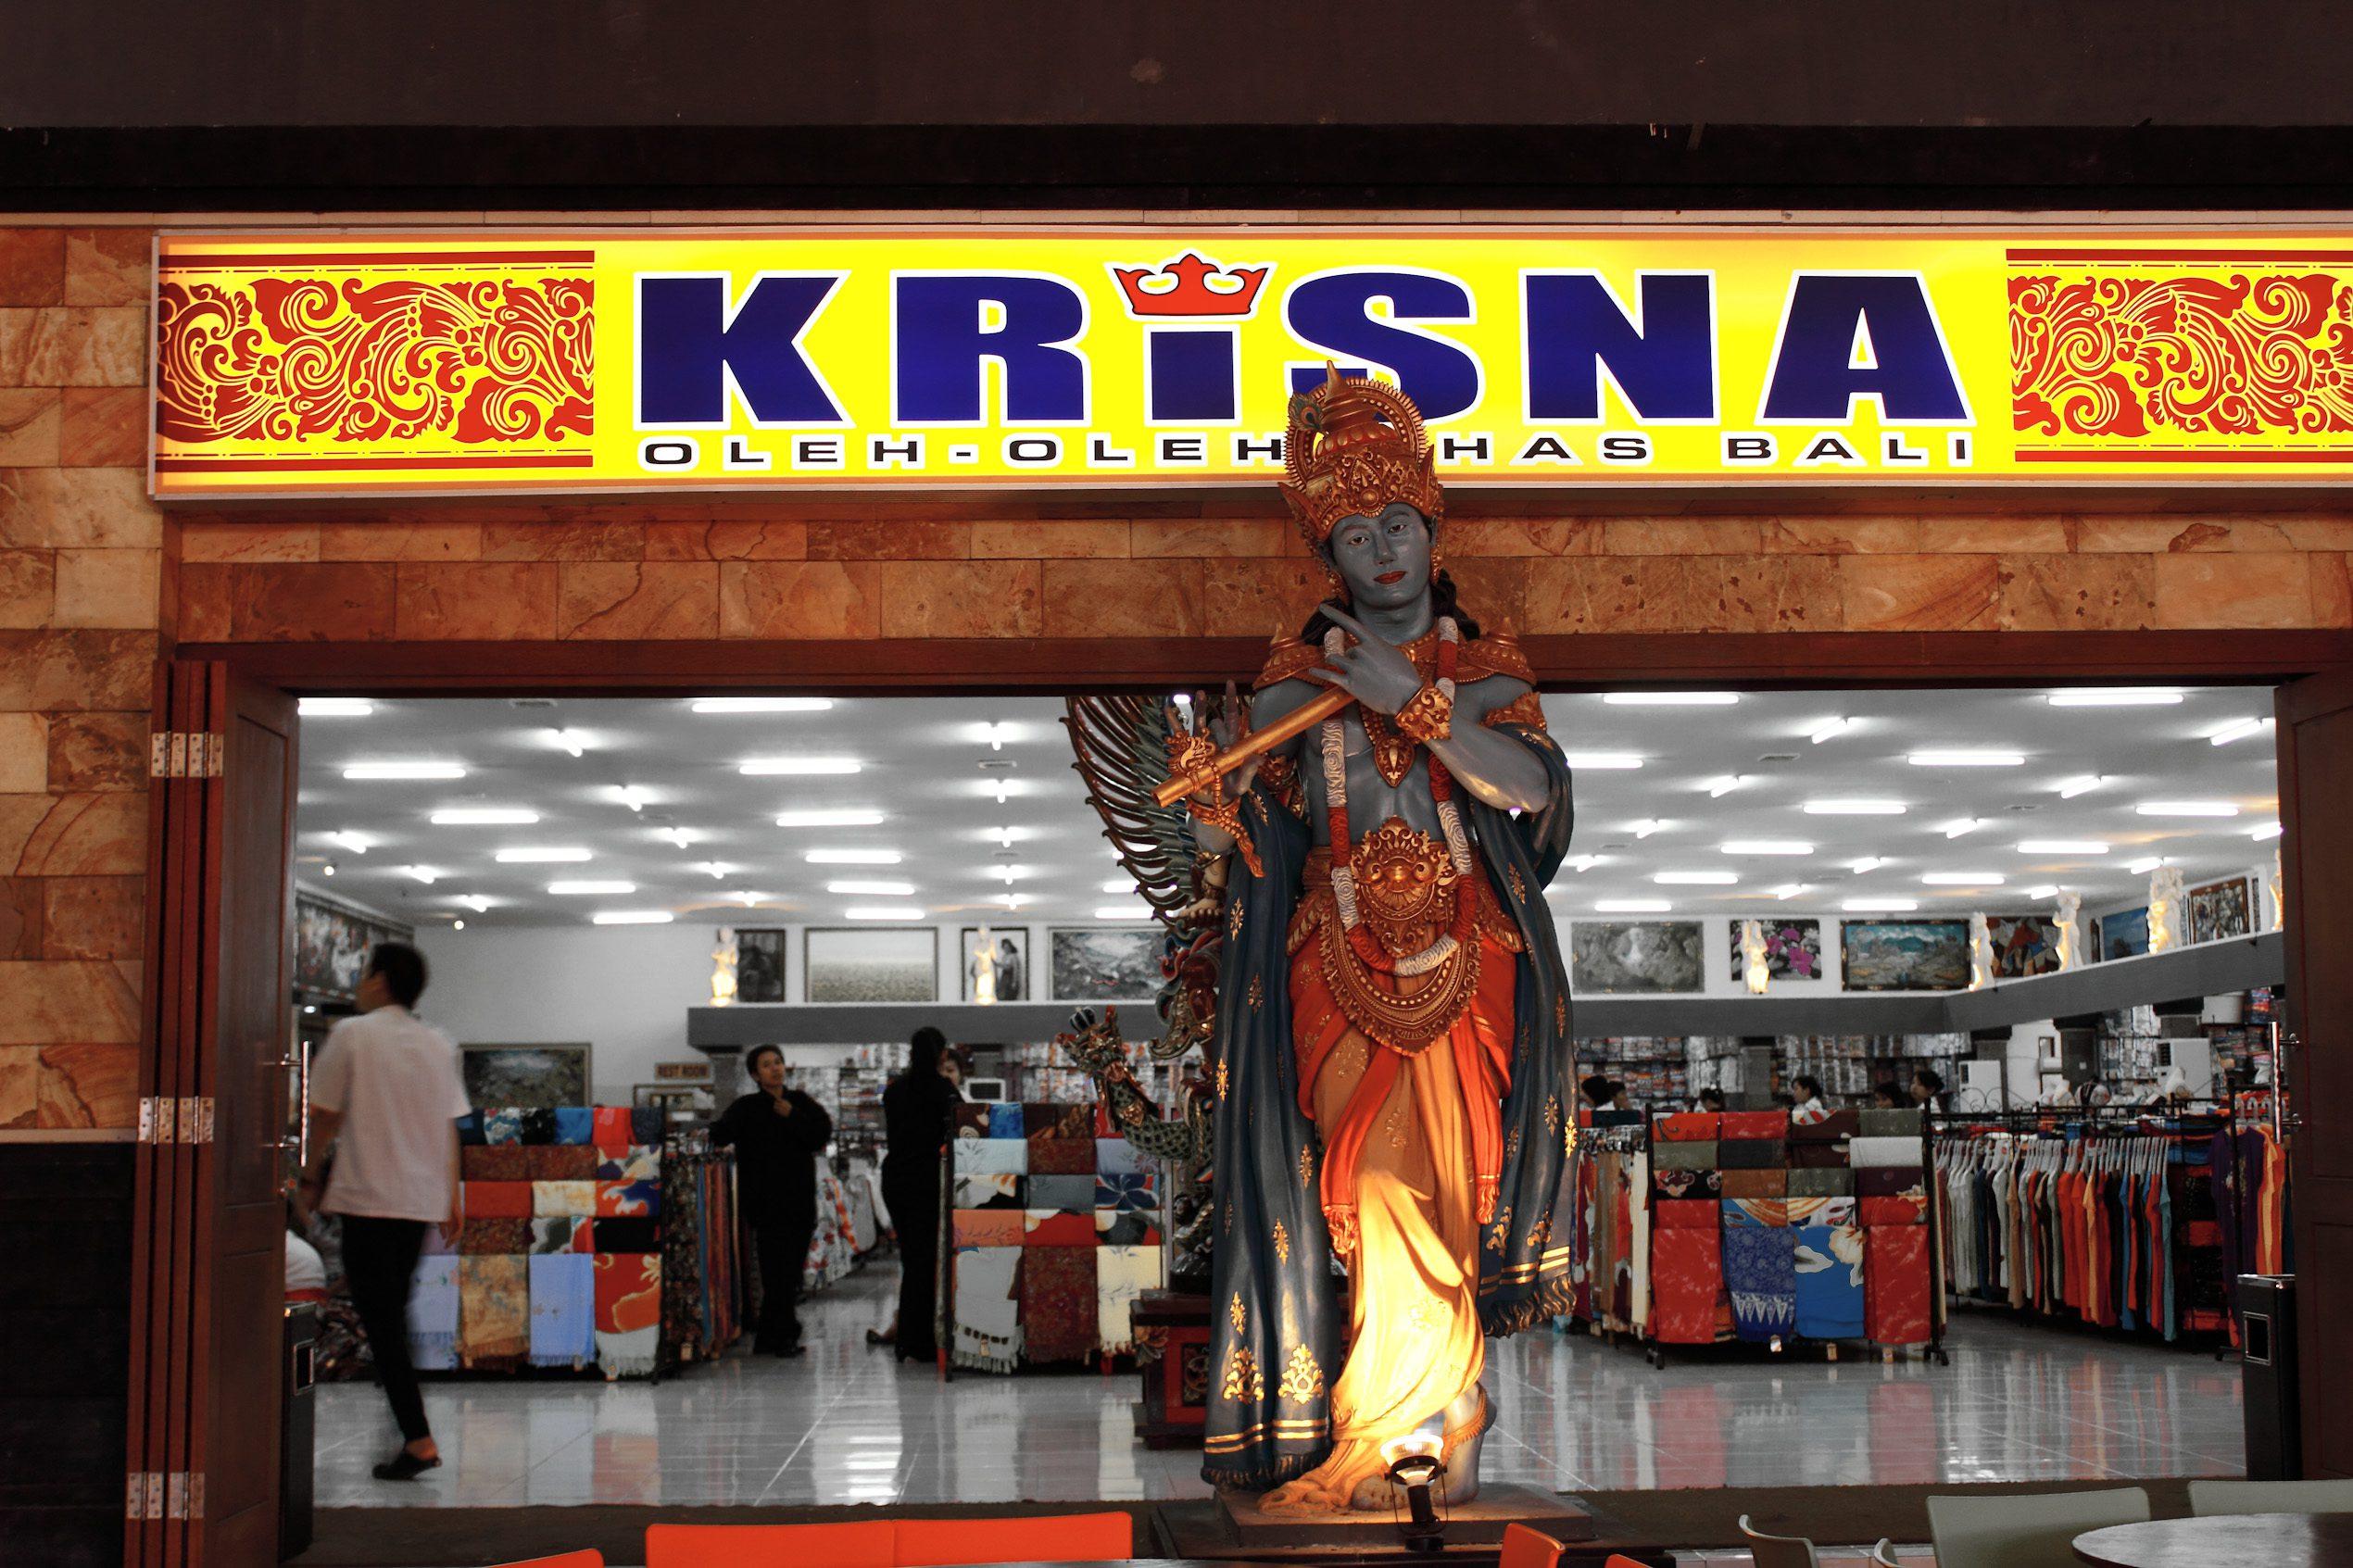 Торговый центр Oleh-Oleh Krisna